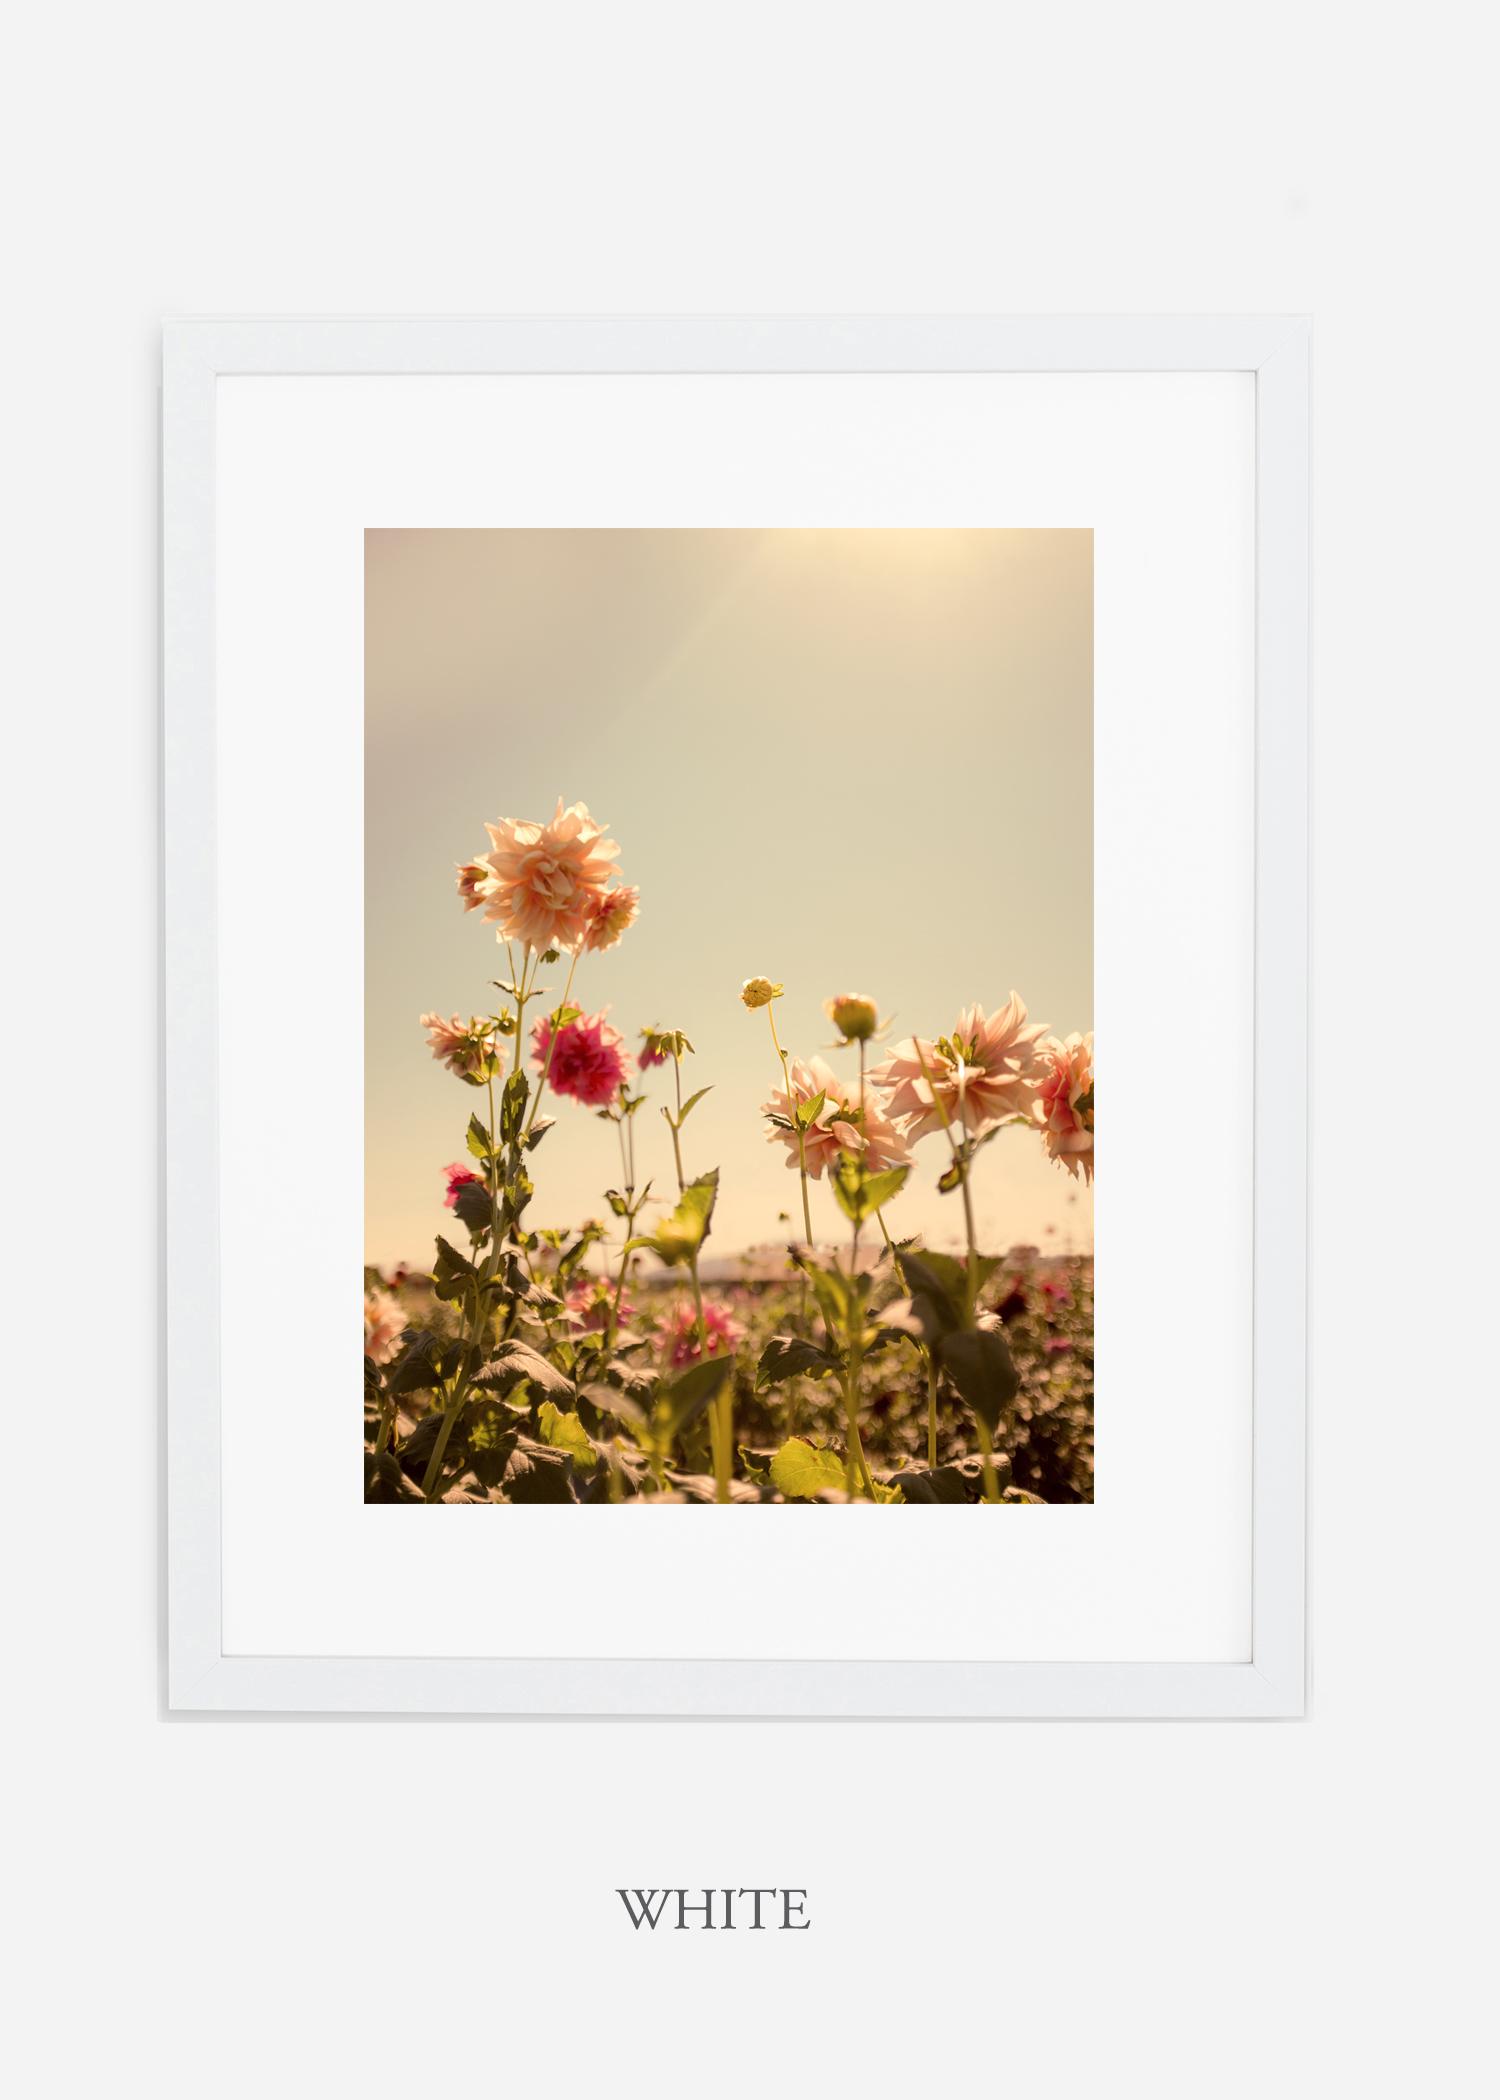 DahliaNo.3_whiteframe__mat_interiordesign_botanicalprint_art.jpg